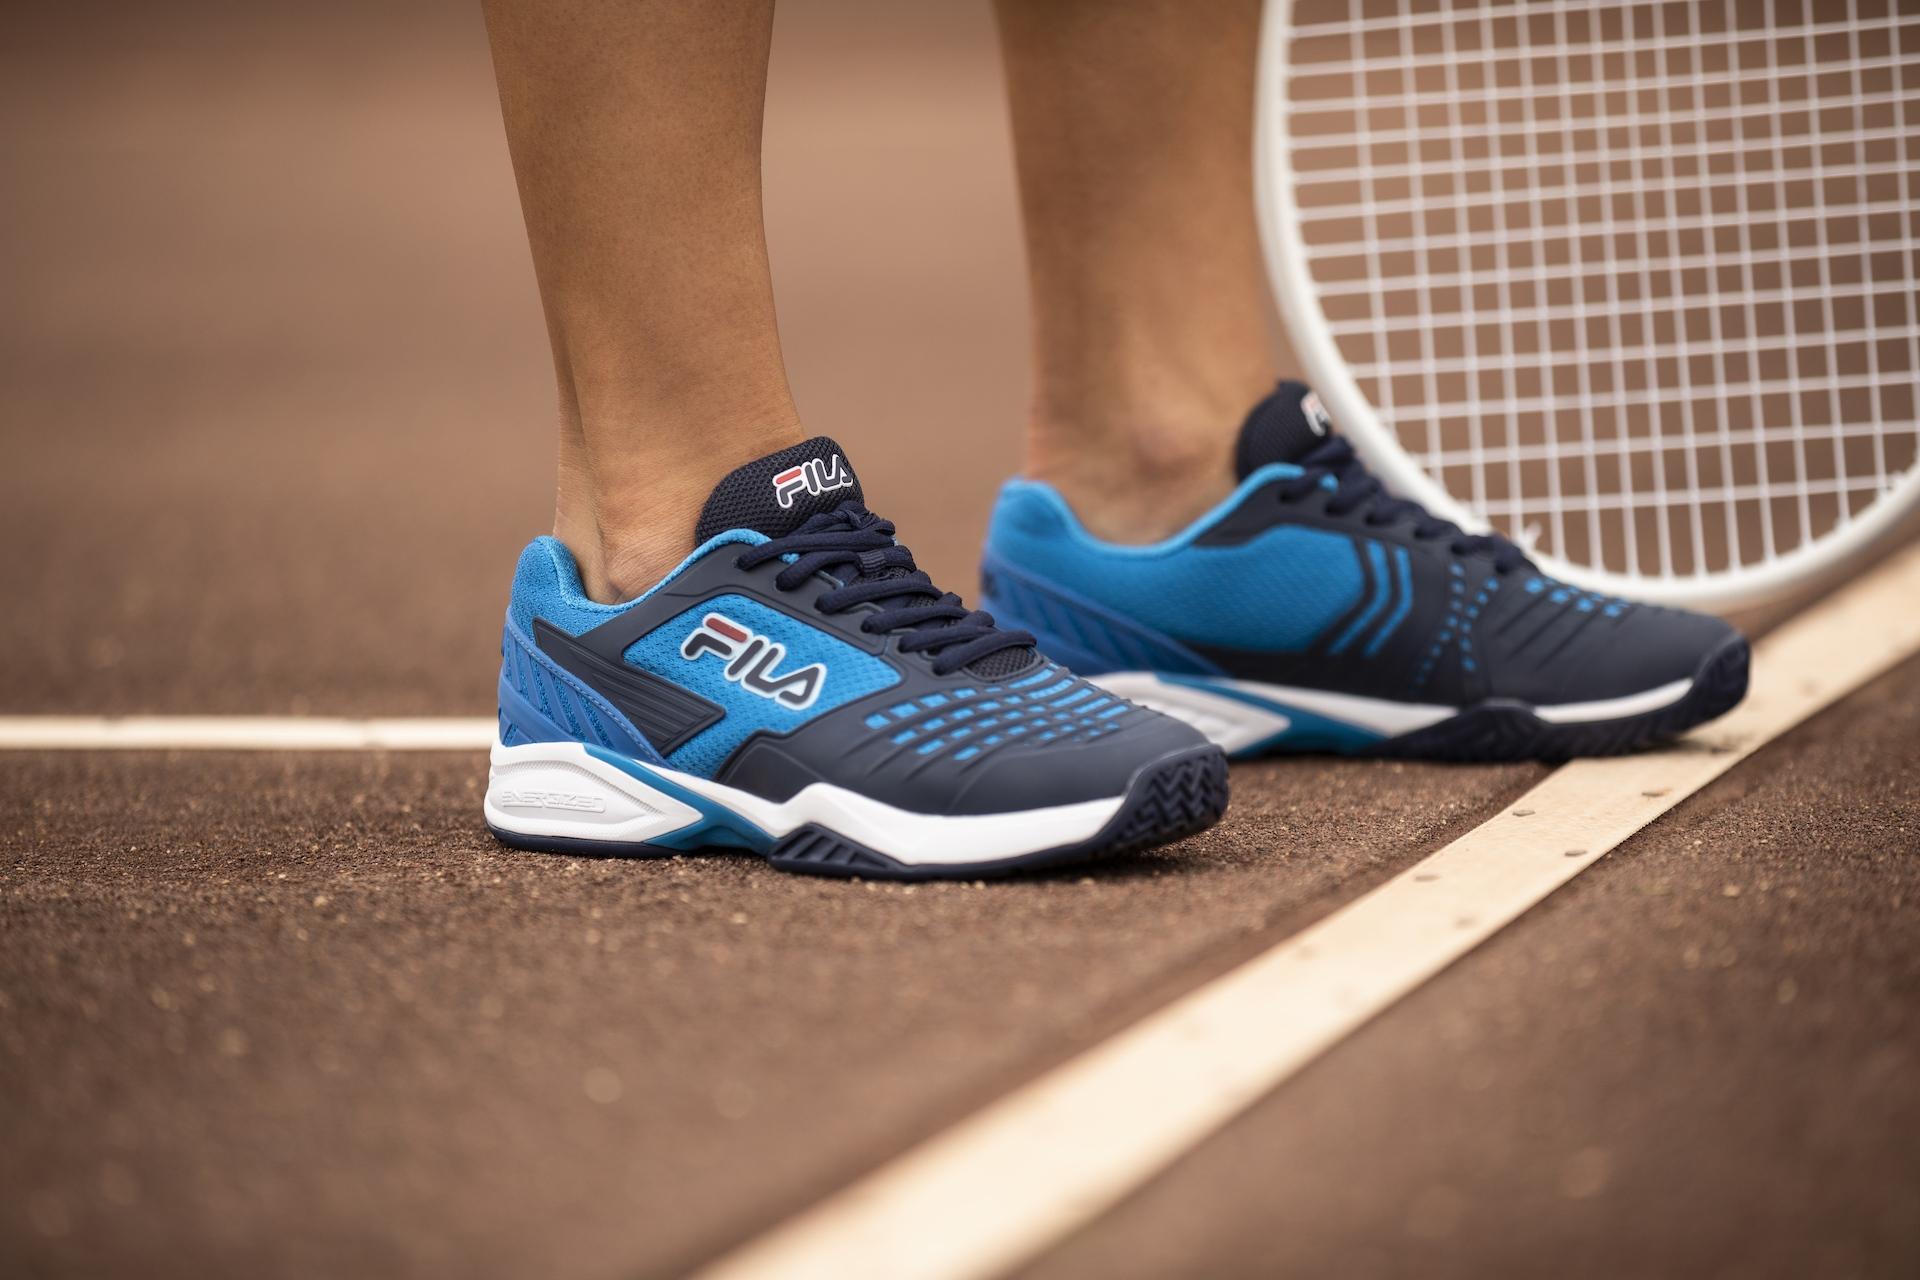 Axilus 2 Energized tennis shoe for women